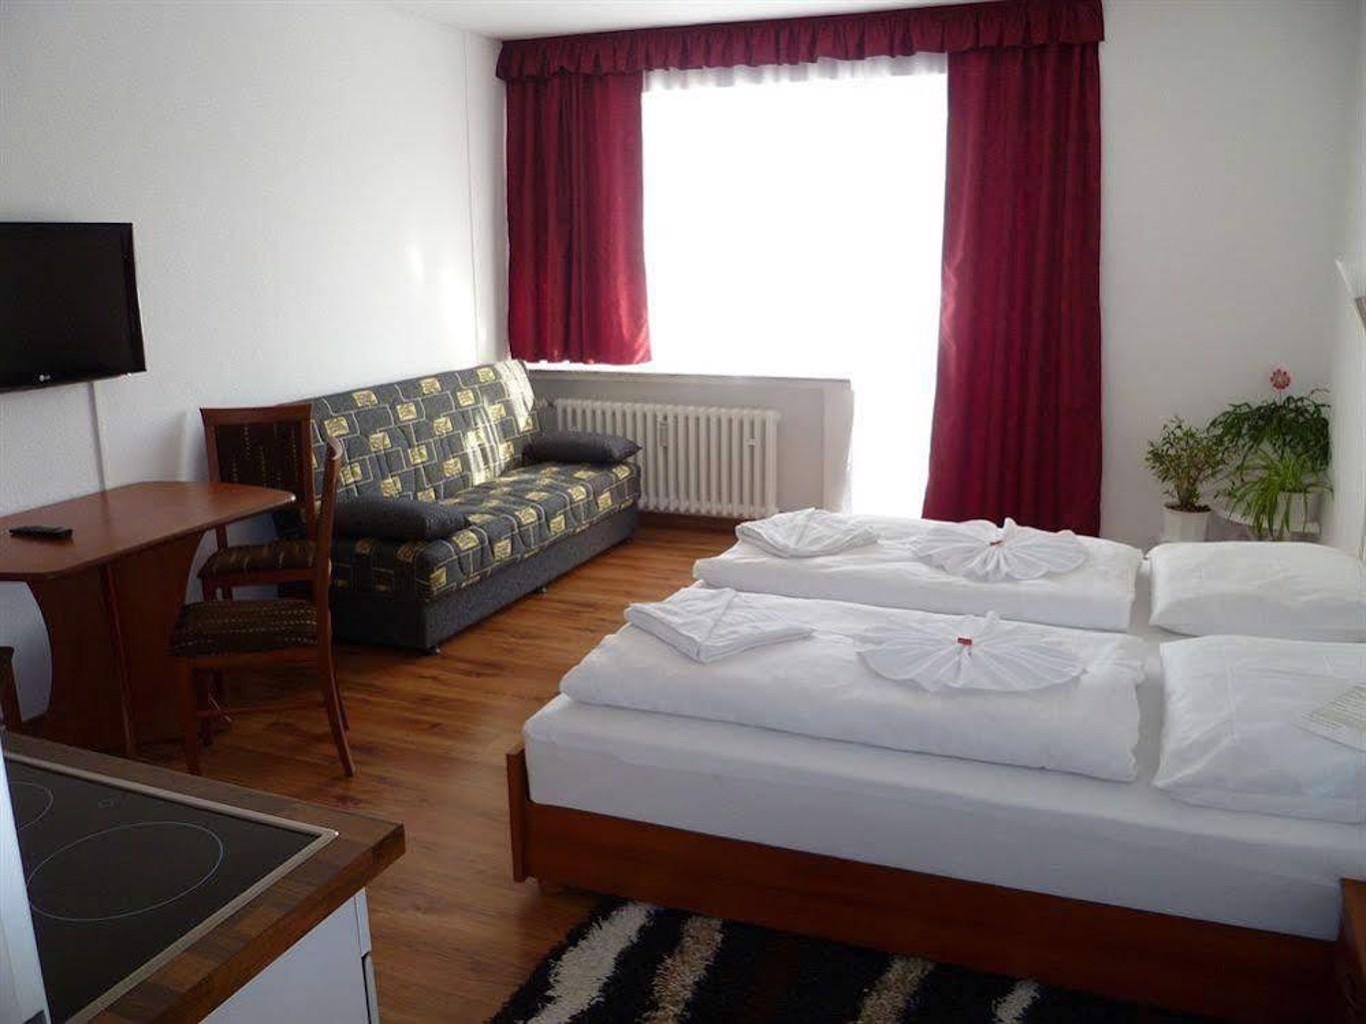 Apartmenthaus Berlin Holiday